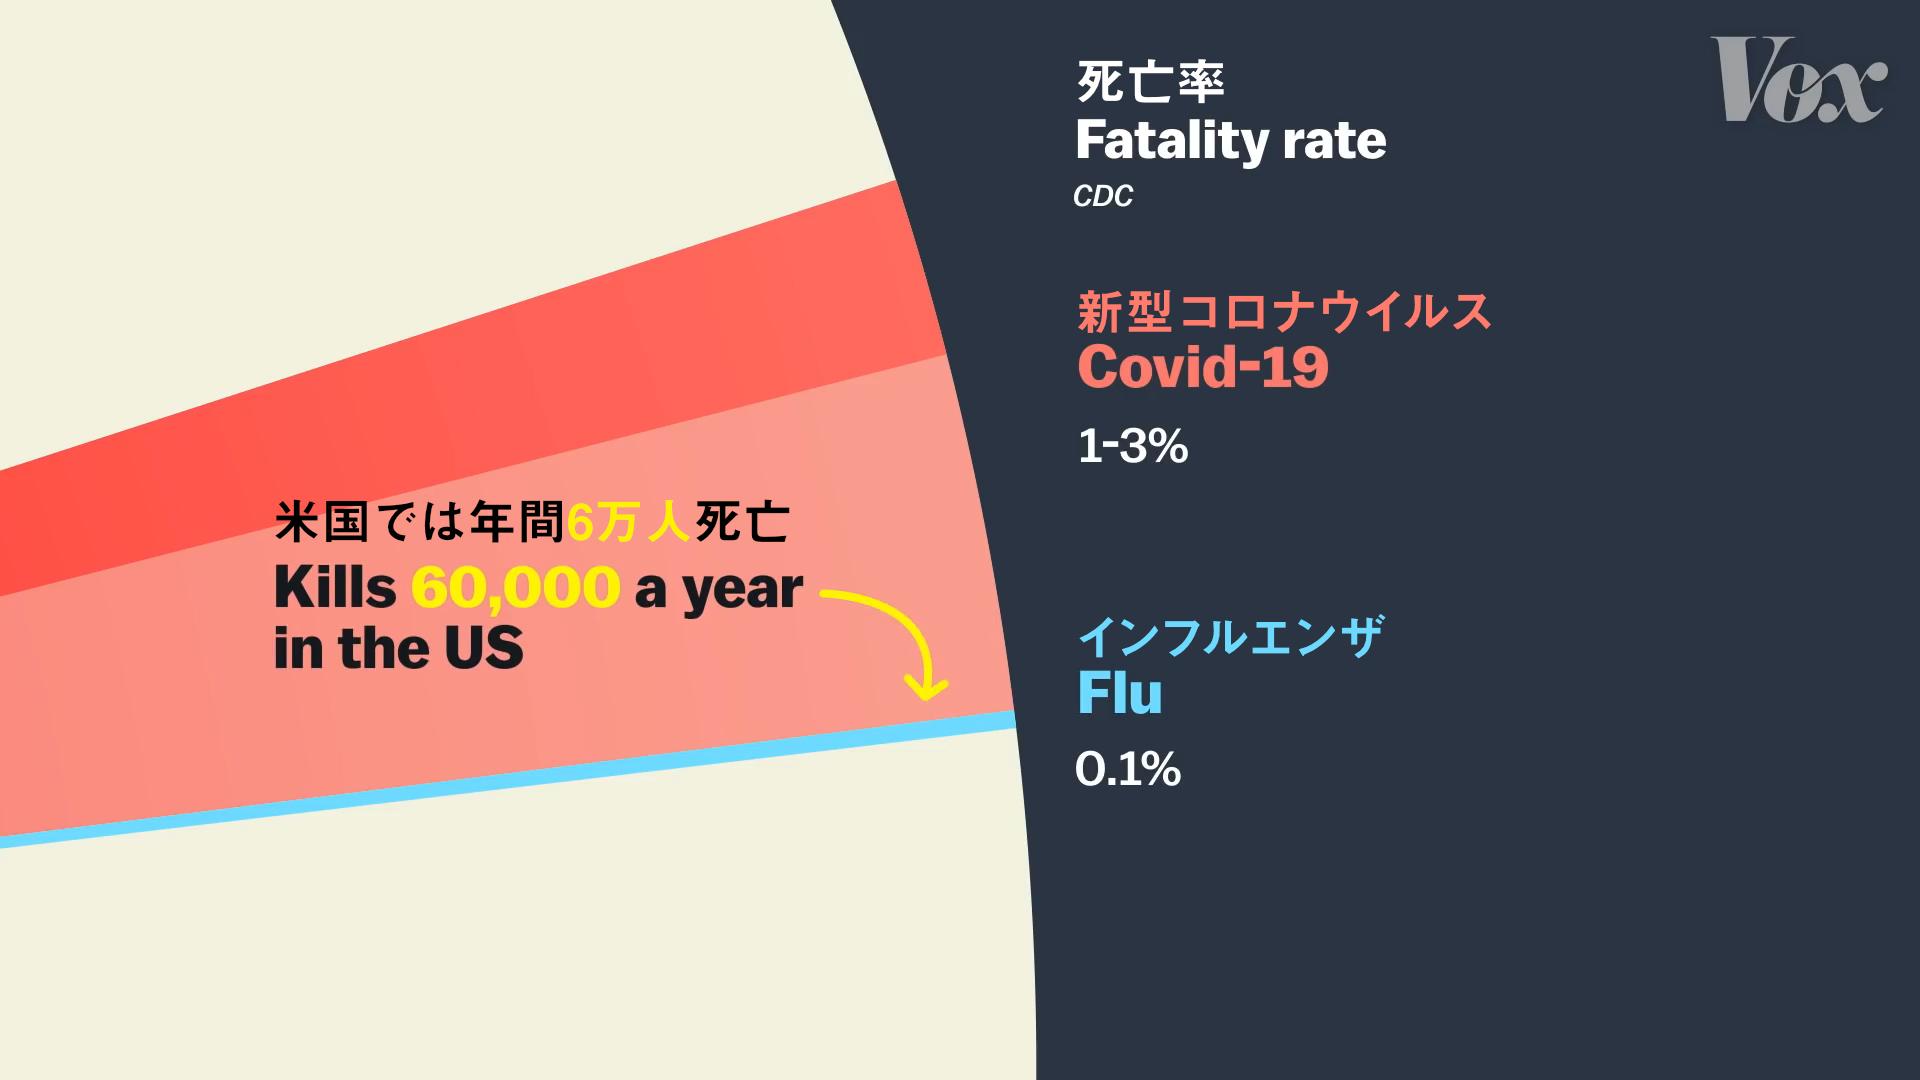 f:id:Imamura:20200408133435p:plain